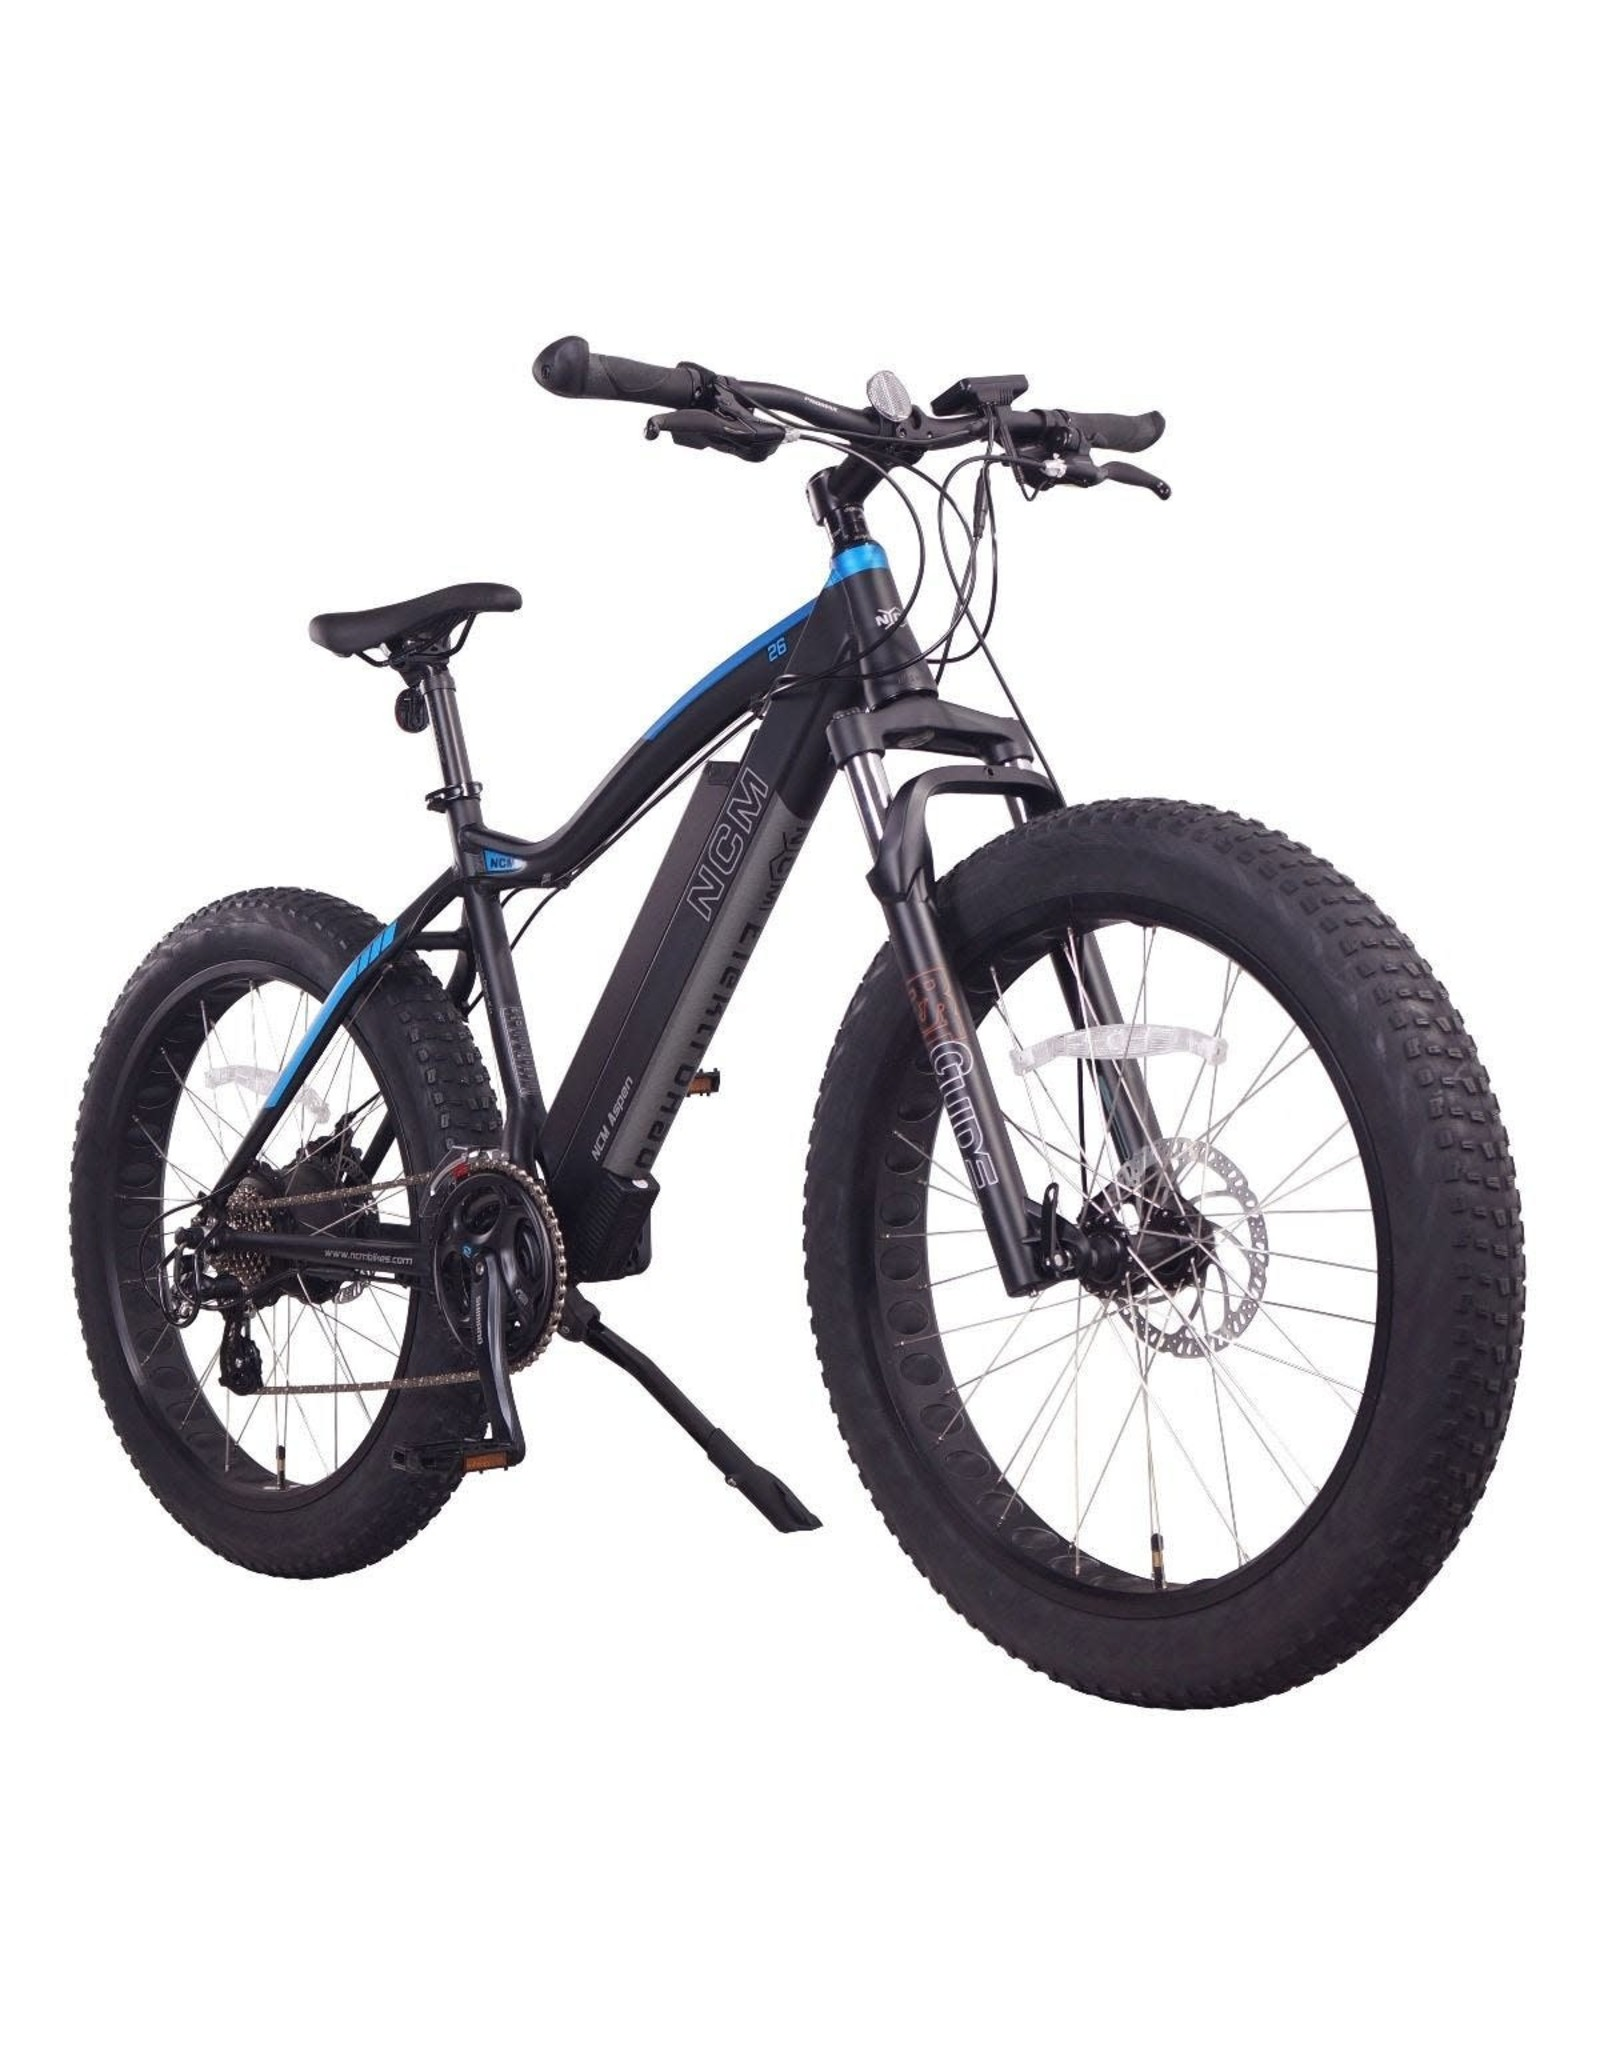 LEON CYCLE Leon Cycle NCM ASPEN electric fat bike